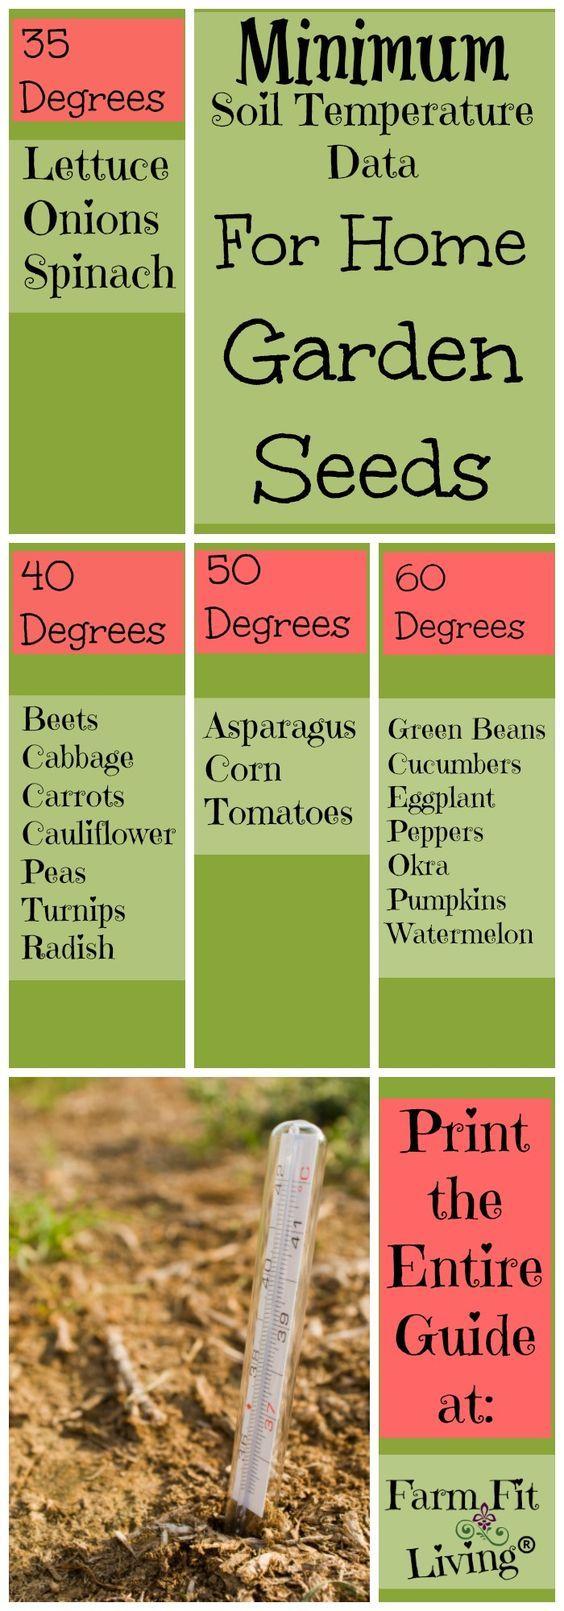 Check soil temperature data before planting seeds in the soil | Measure soil temperature | Planting the Garden | Home Gardens